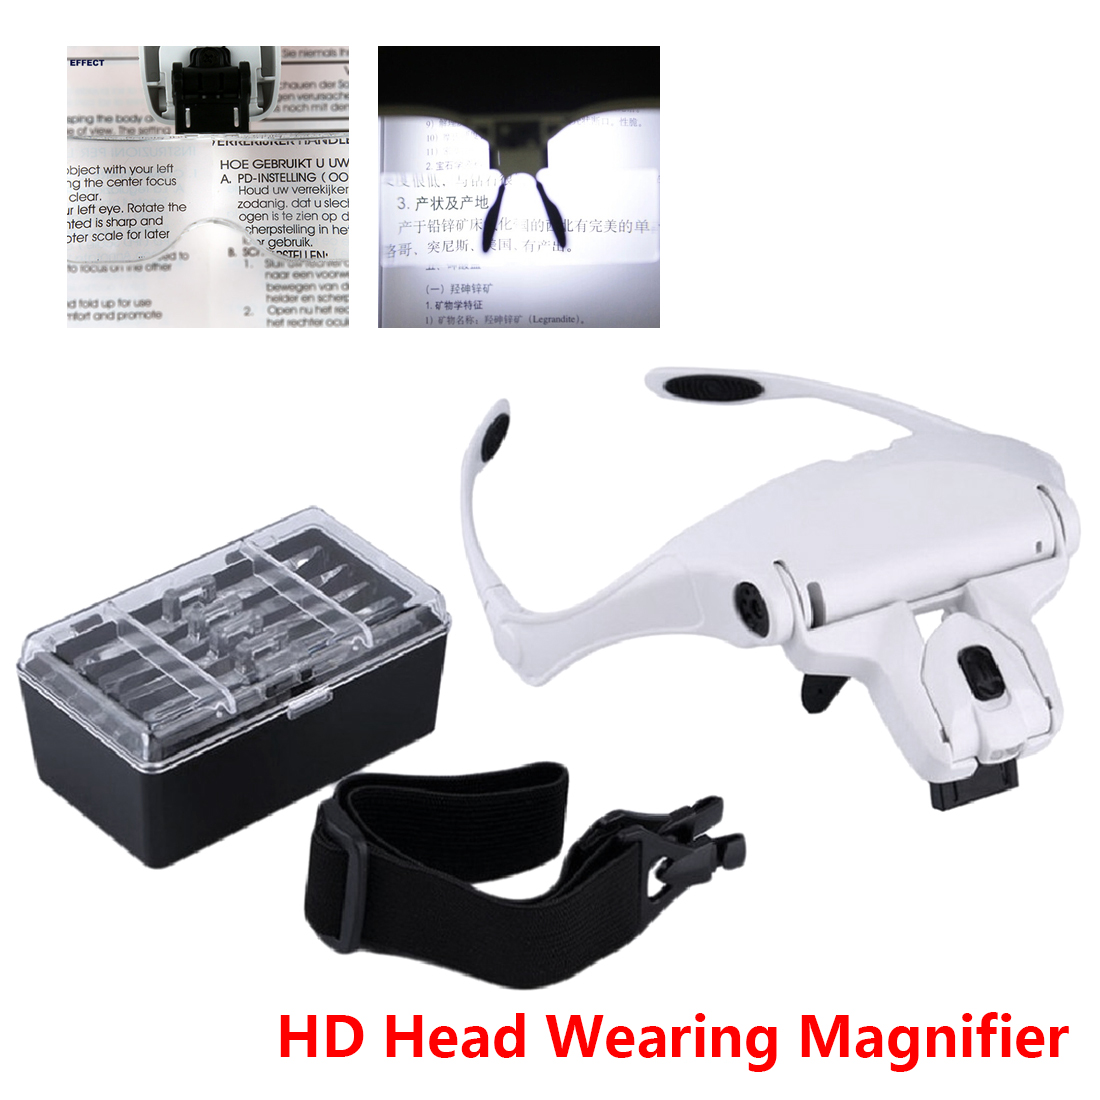 Stirnband Lupe Kreative 1,0X1,5X2,0X2,5X3,5X5 Objektiv Einstellbar LoupeMagnifier Mit LED Lupen